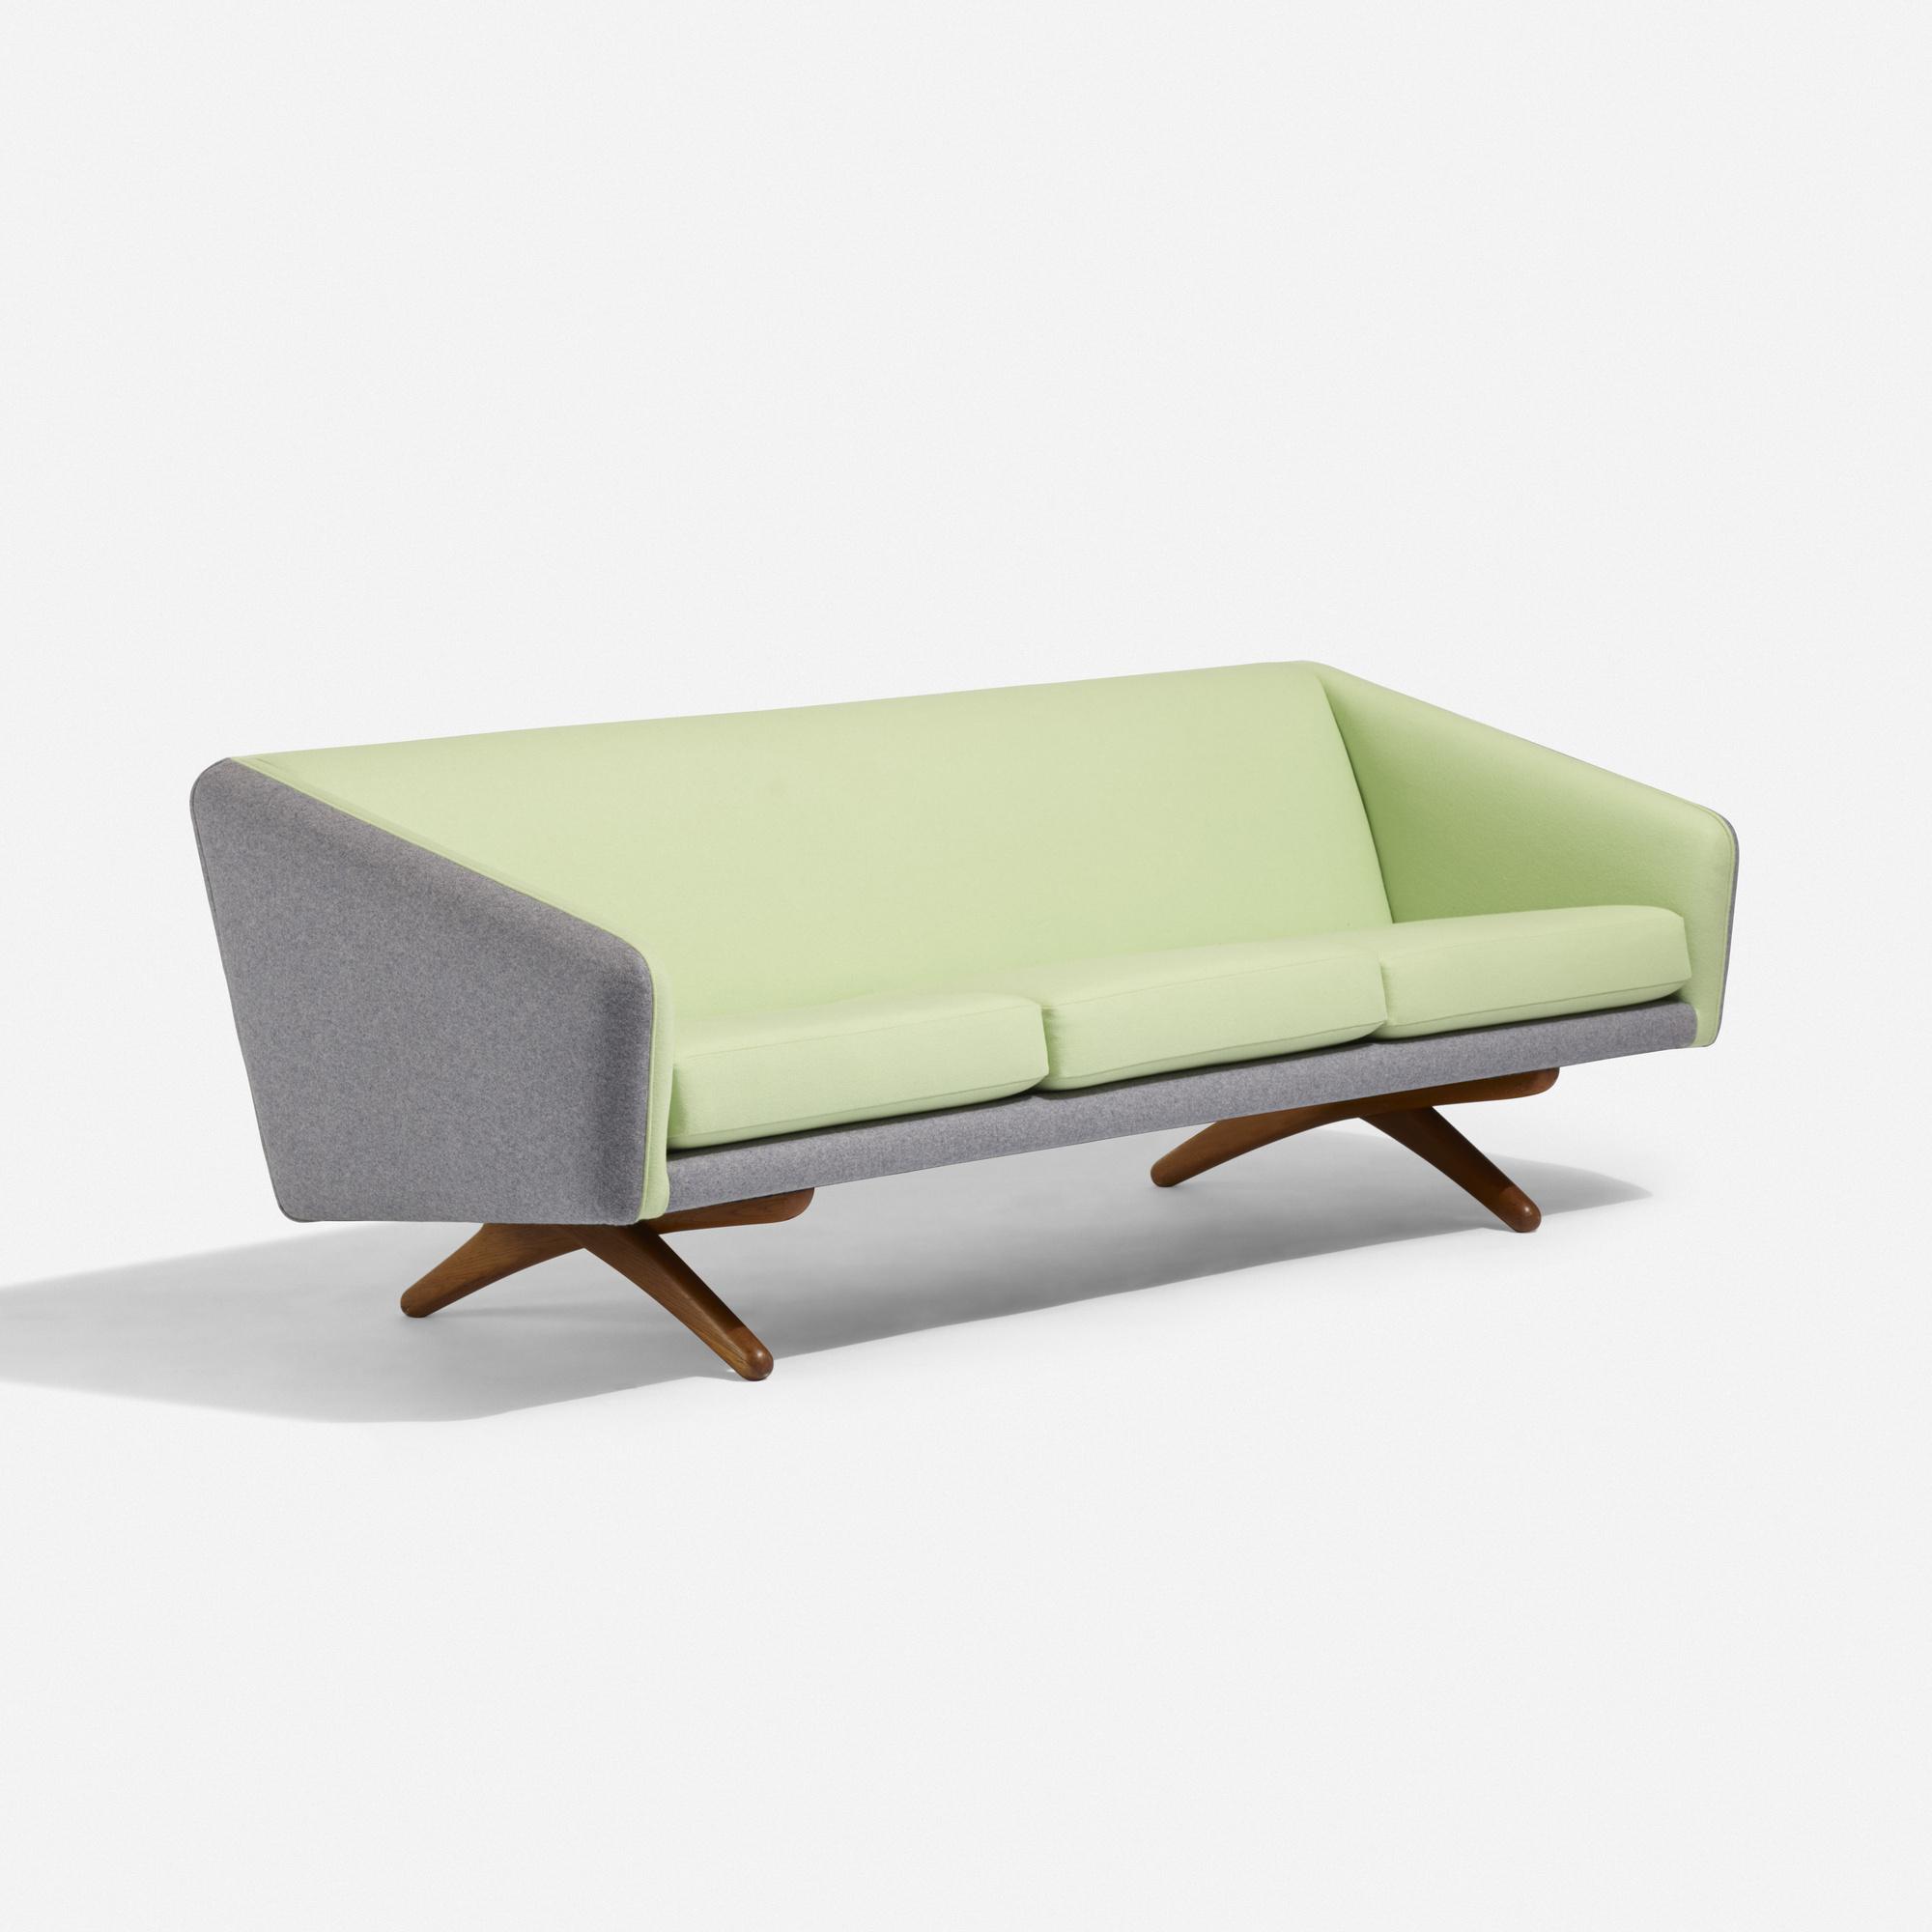 211 Illum Wikkelsø Sofa 1 Of 3